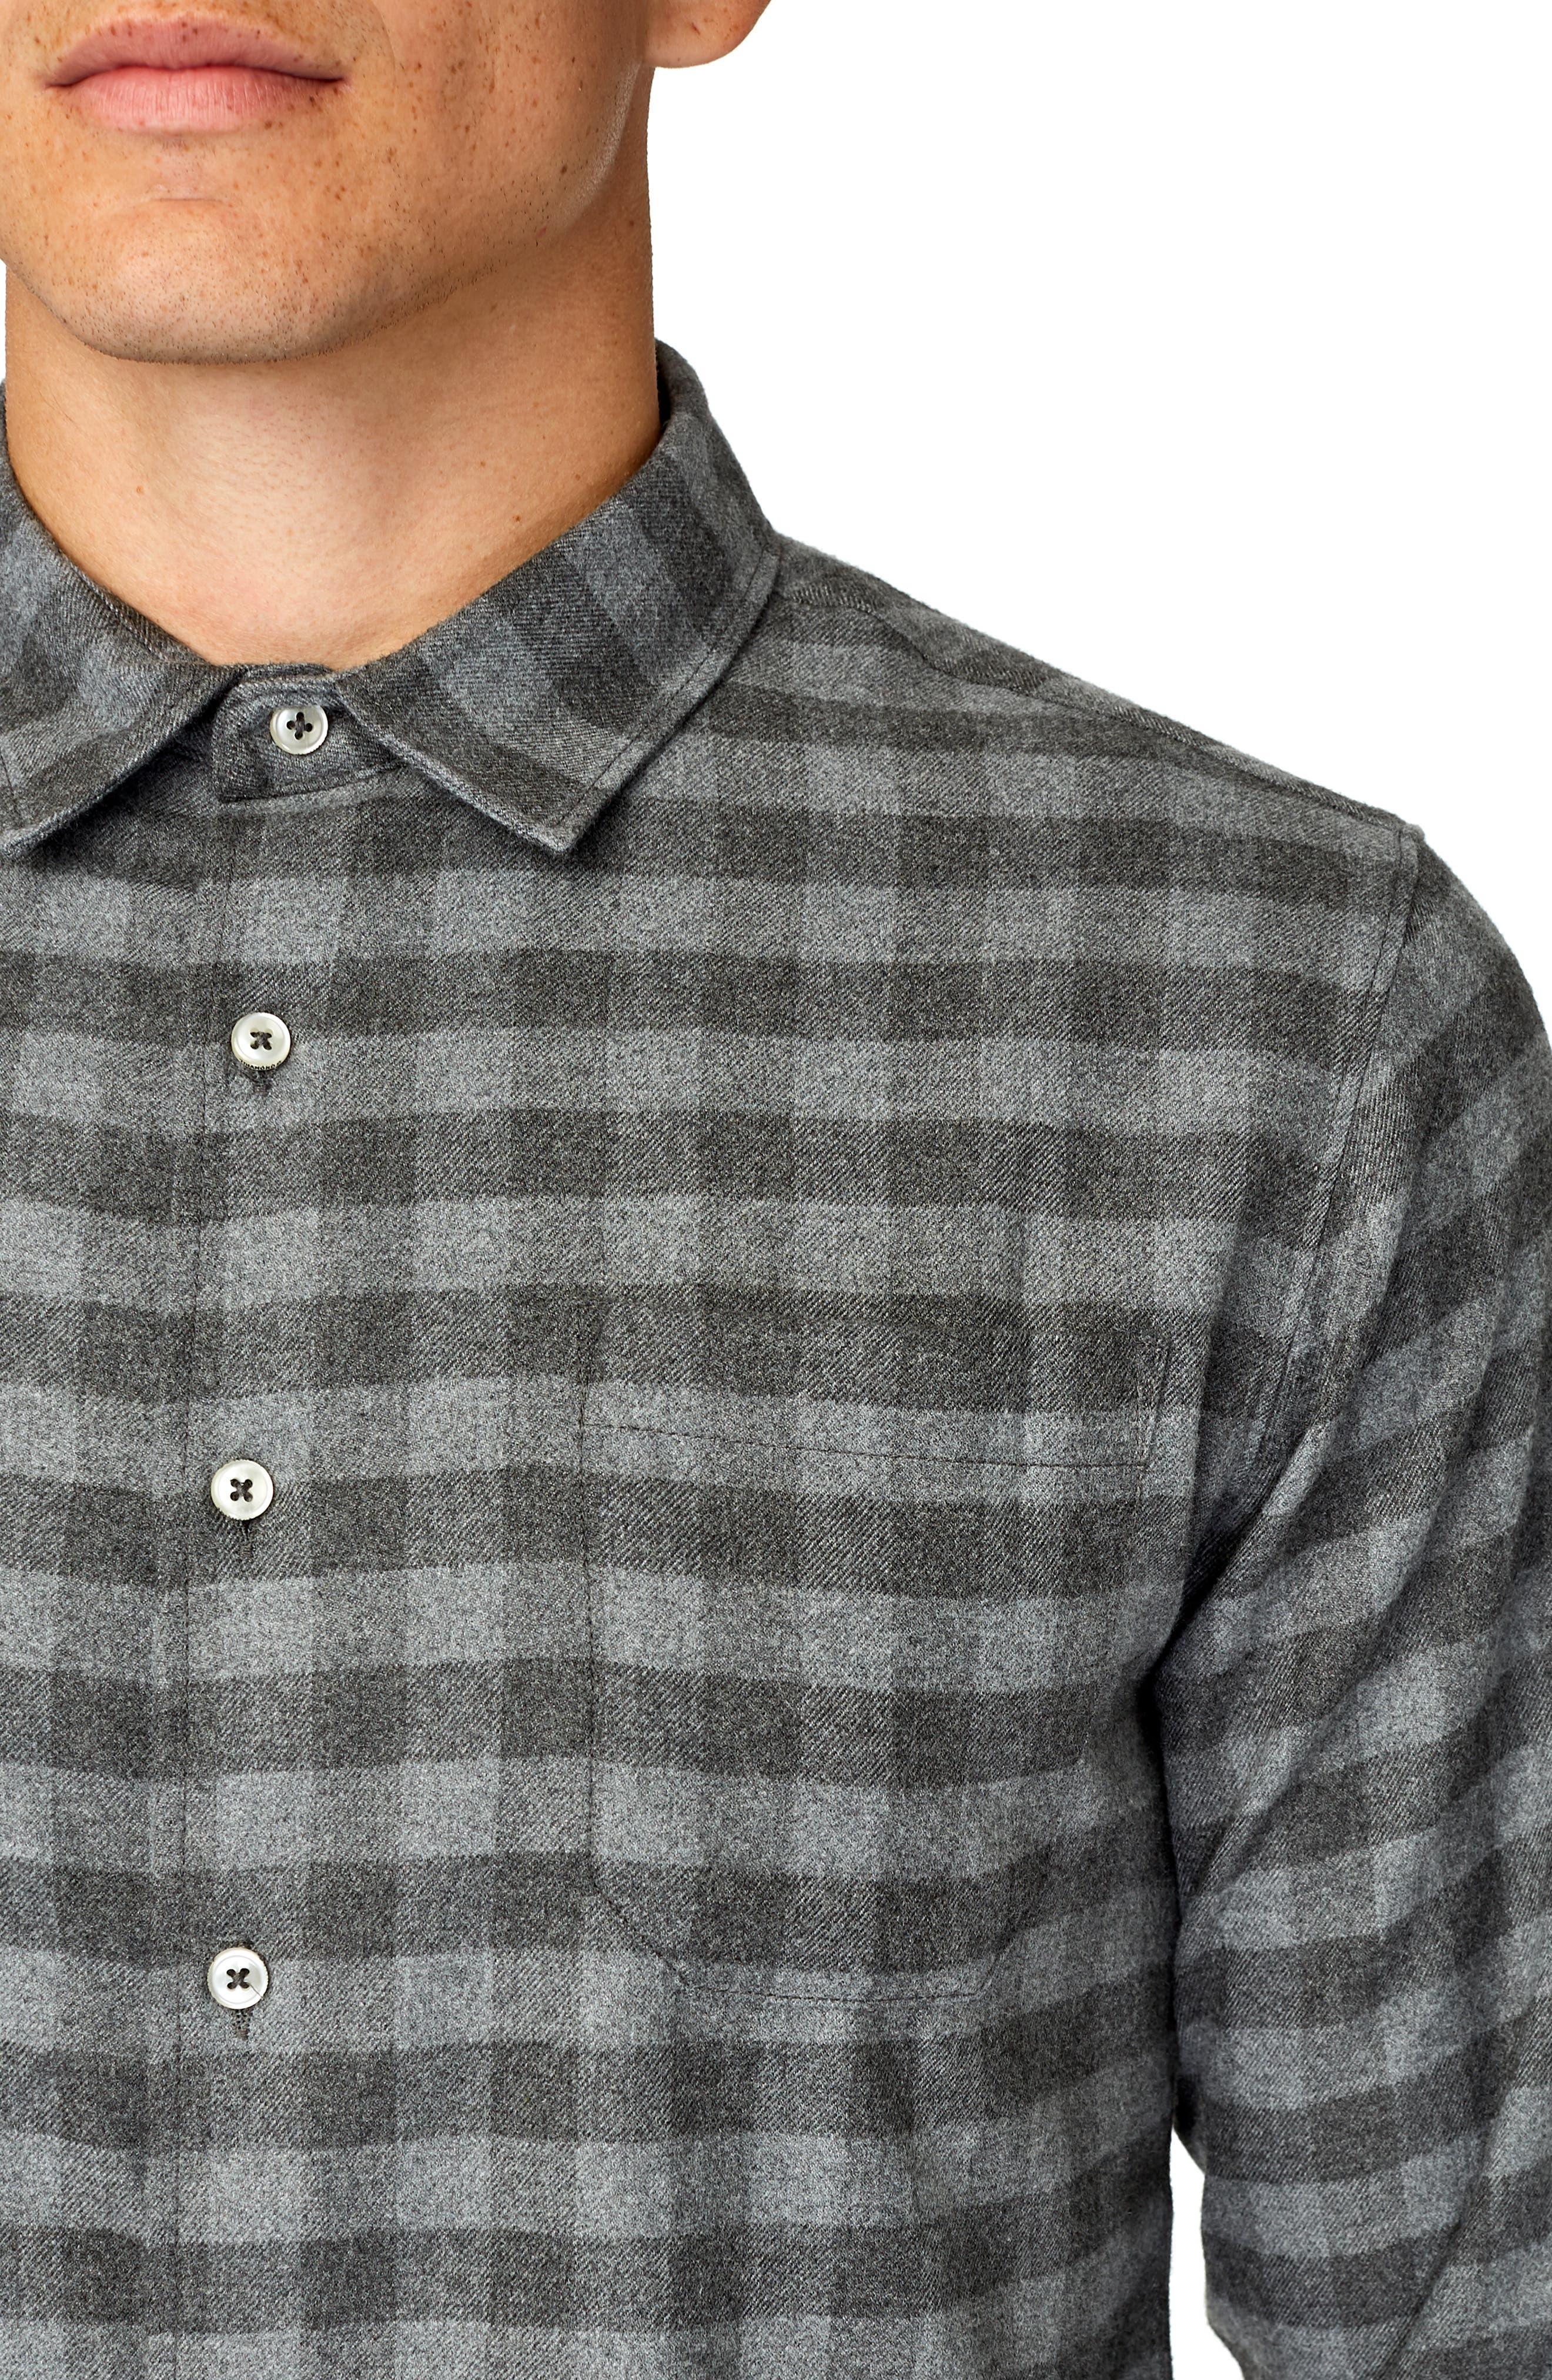 Asher Trim Fit Flannel Shirt,                             Alternate thumbnail 2, color,                             GREY